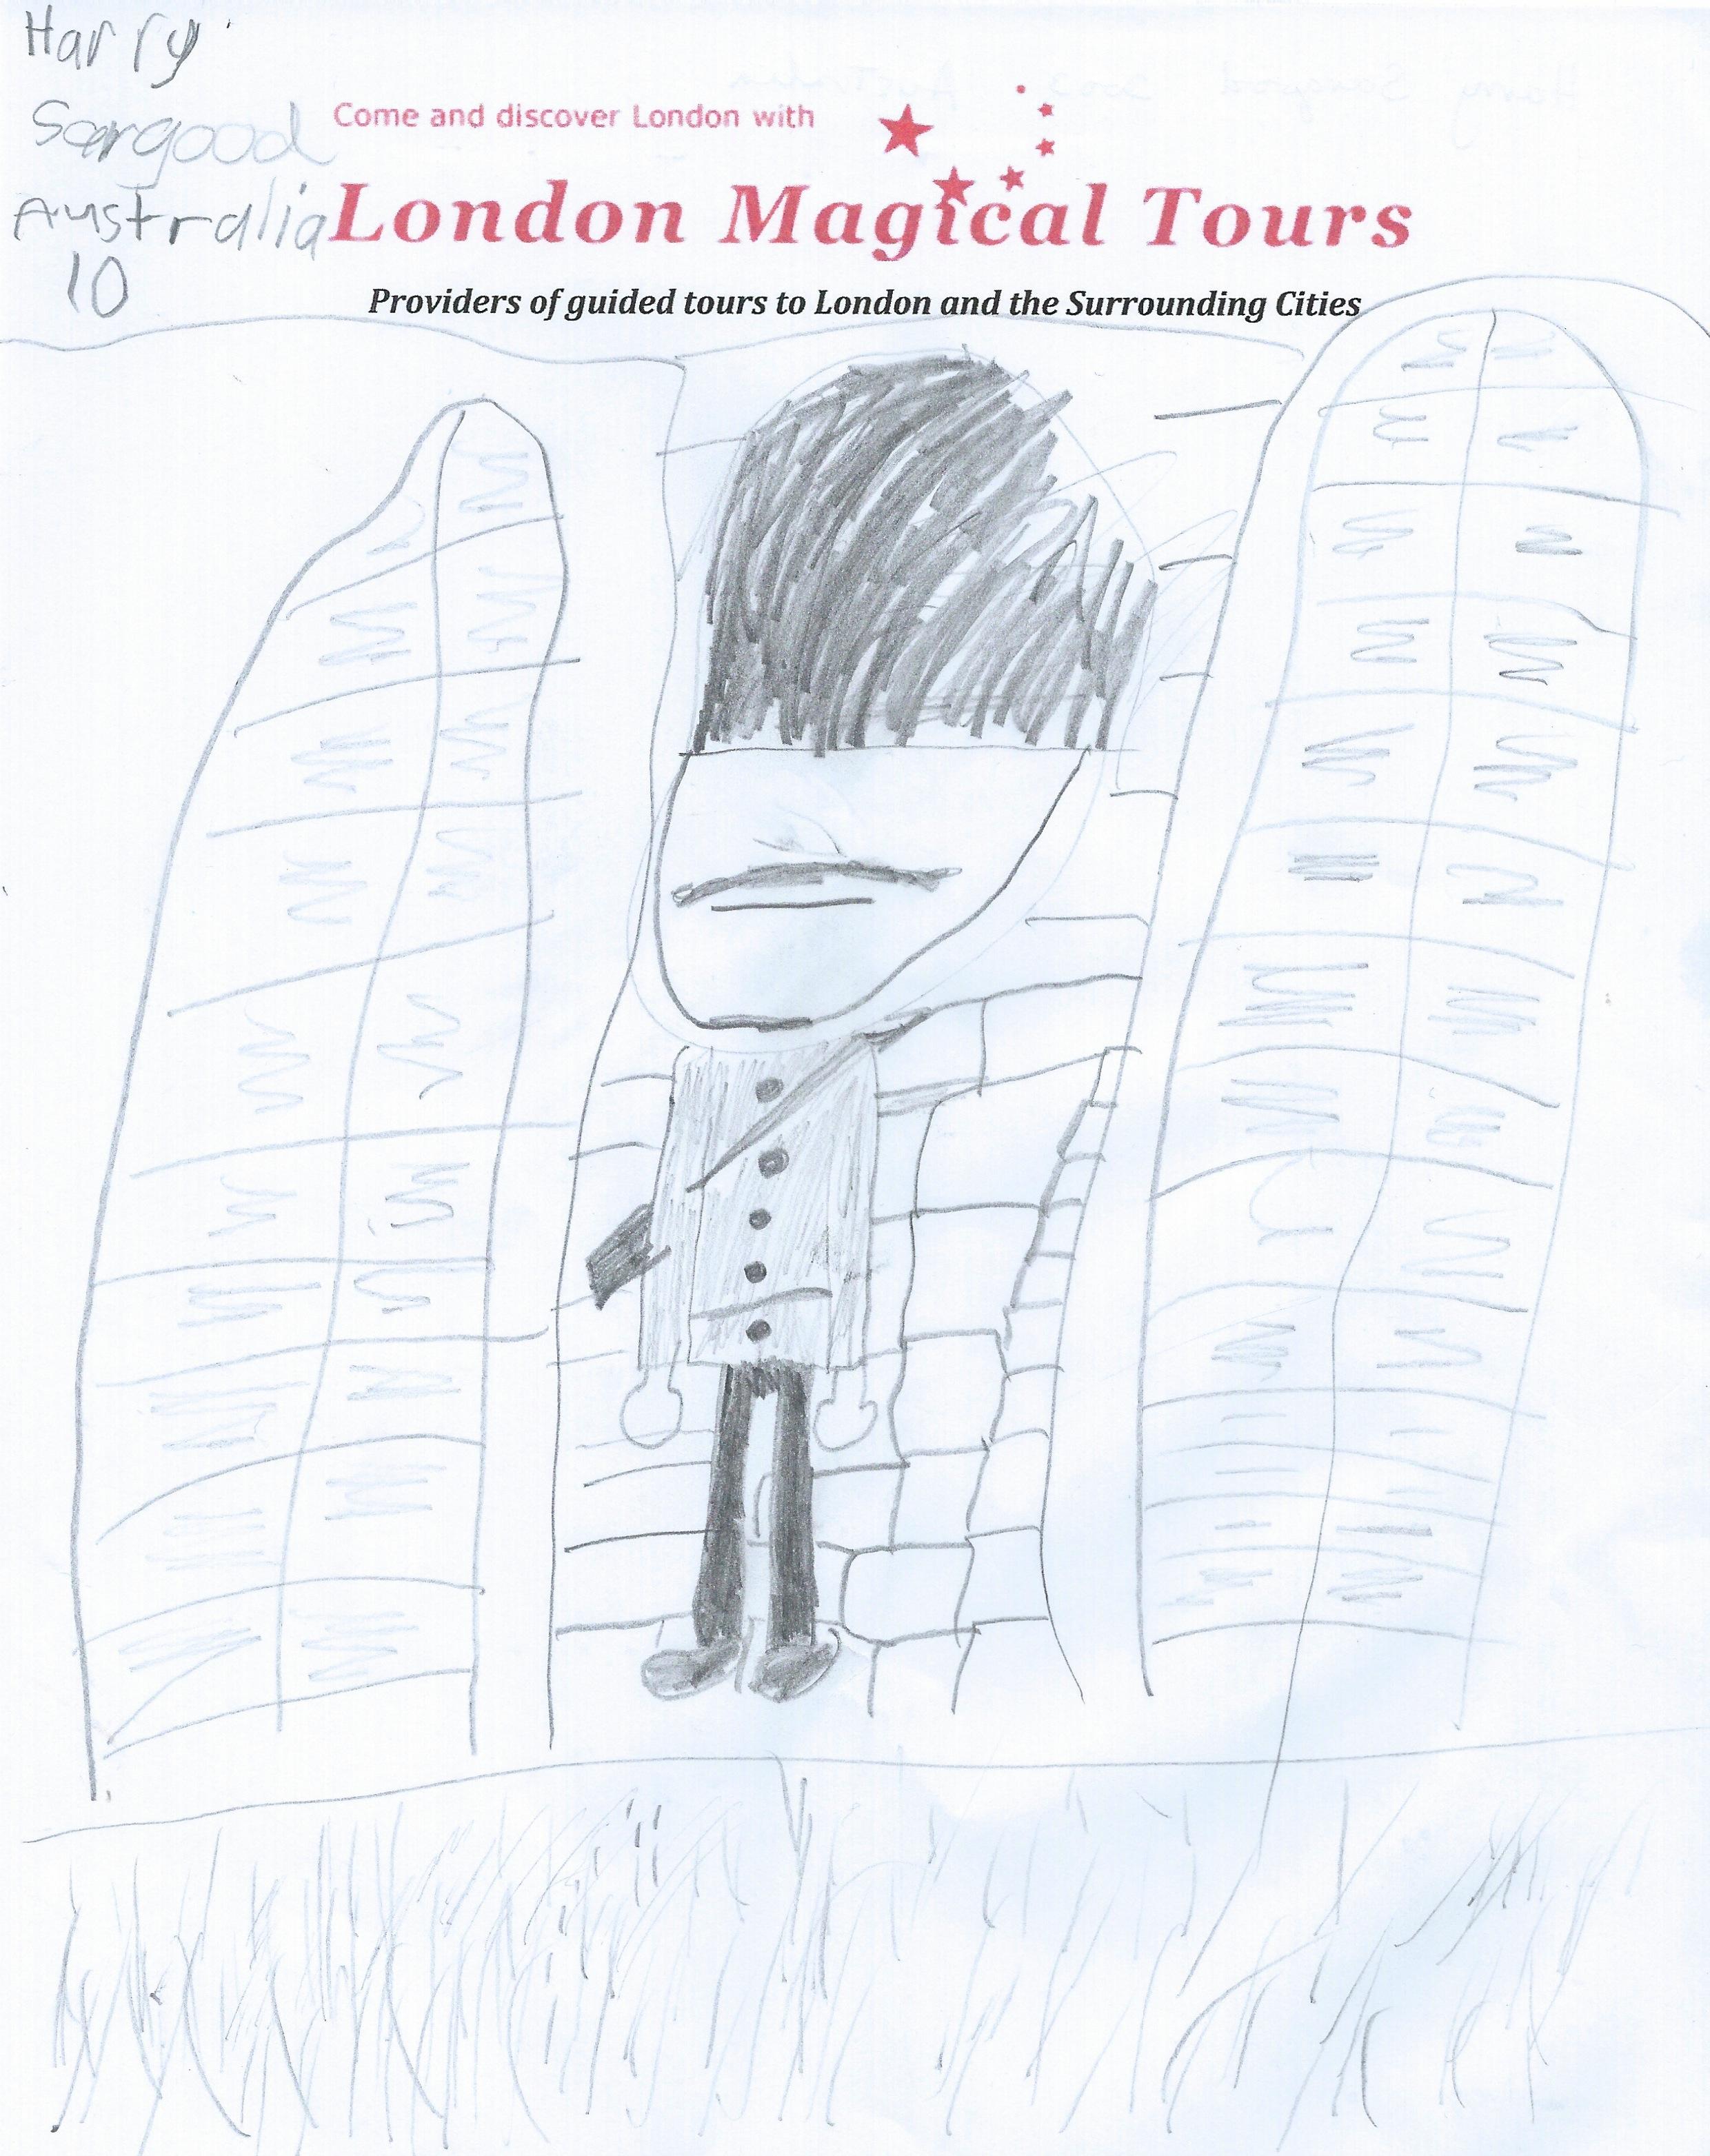 Harry Sargood Drawing